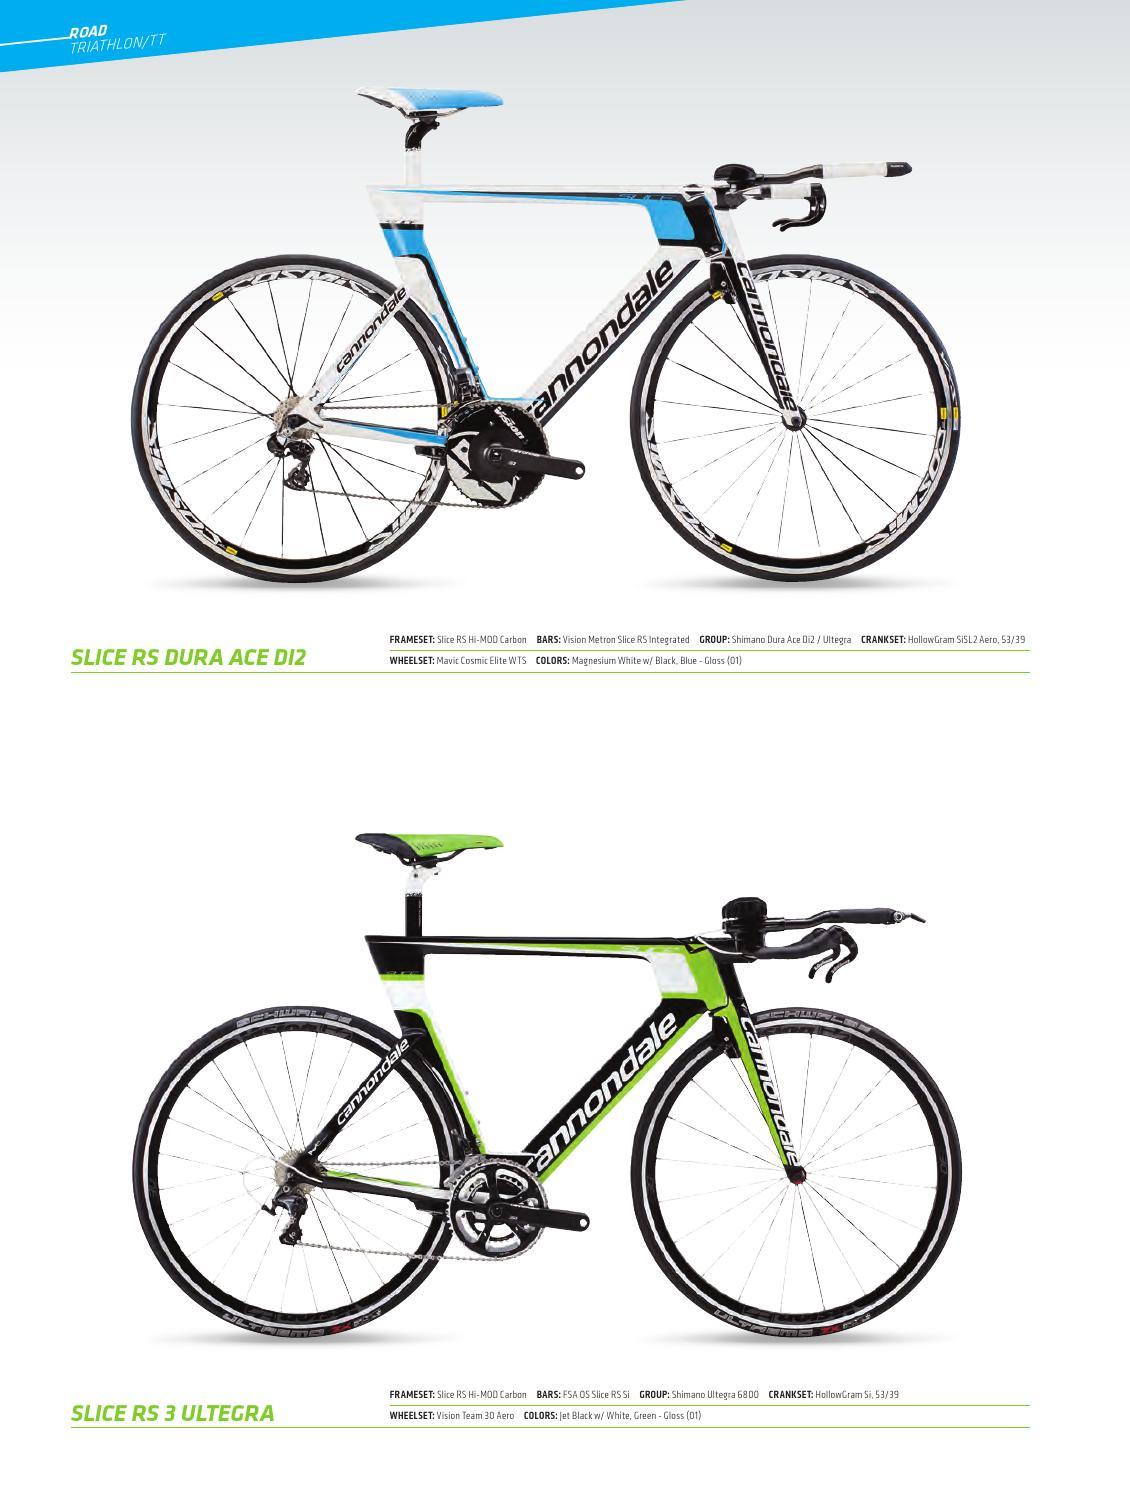 ffd02e5280e 2014 Cannondale Bike Catalog by Cannondale_GLOBAL - issuu